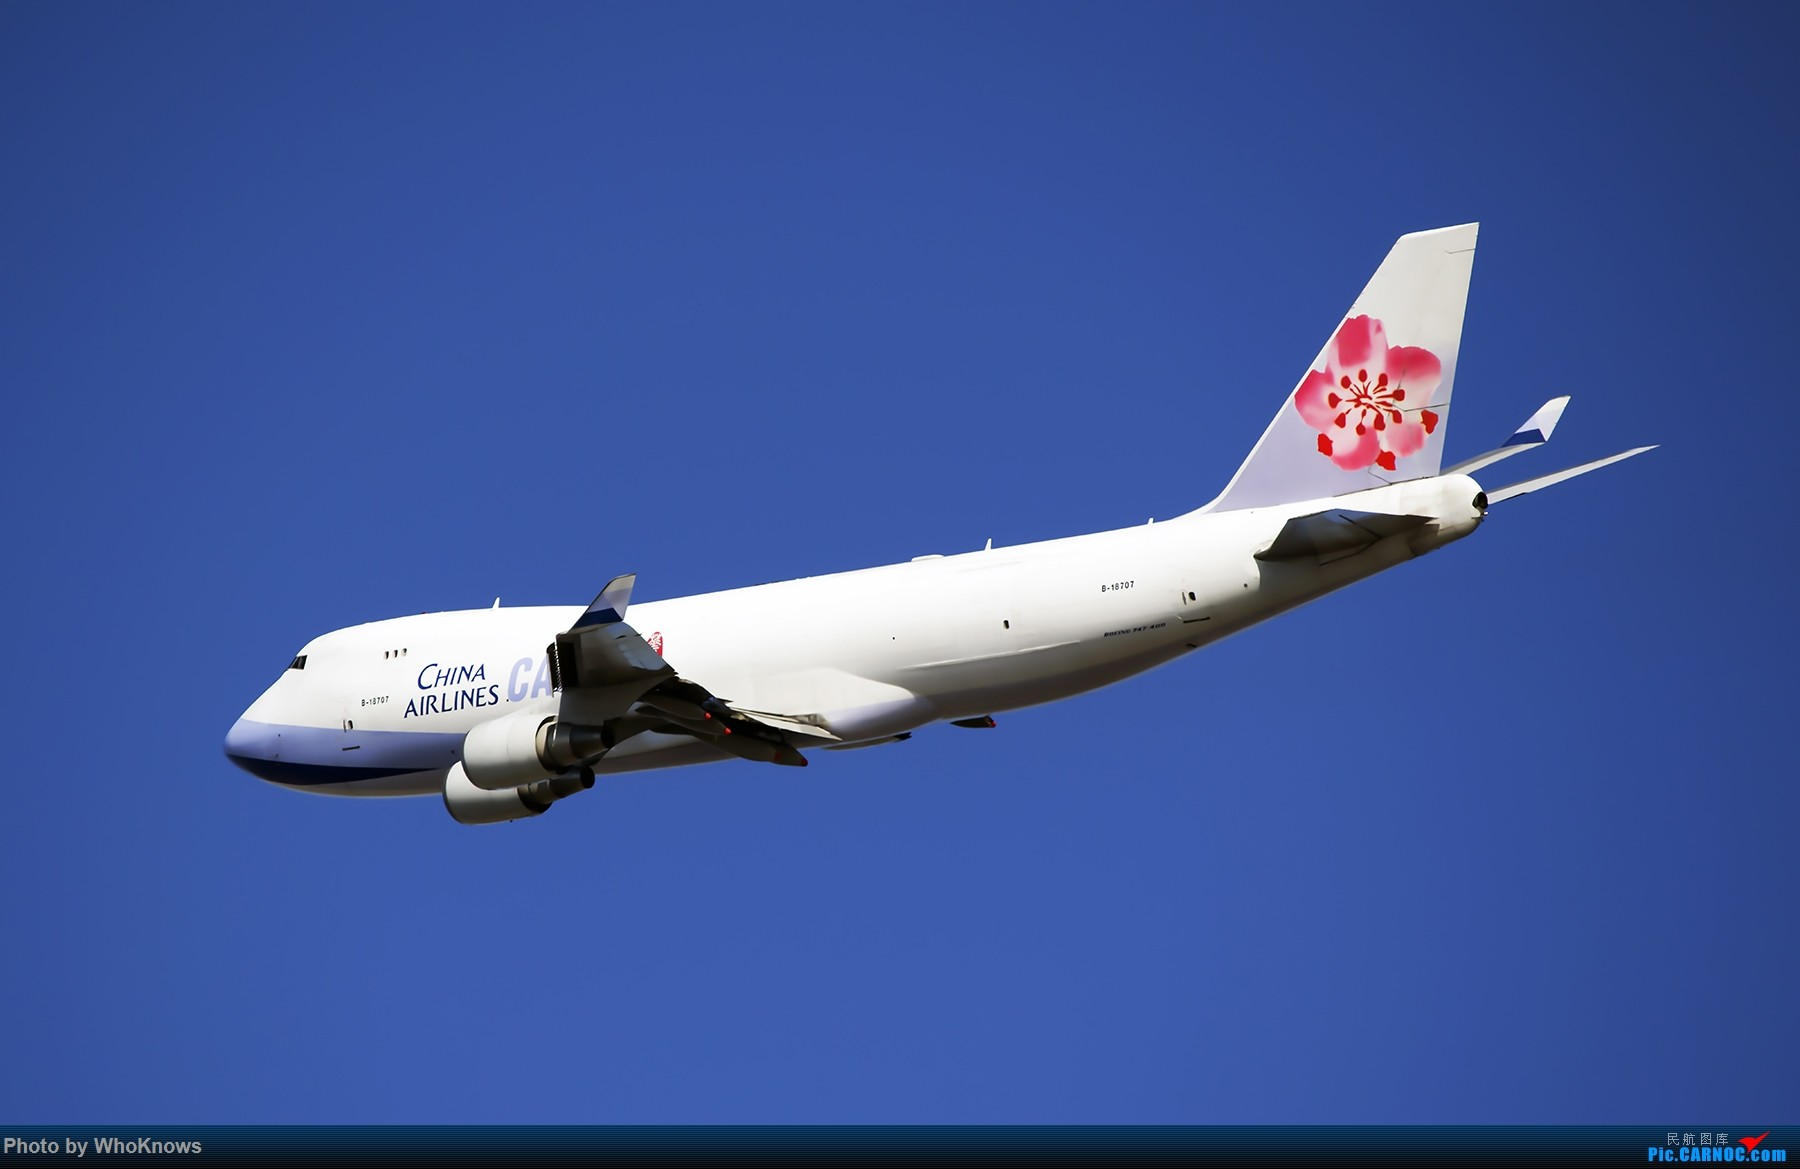 JFK BOEING 747 B-18707 JFK